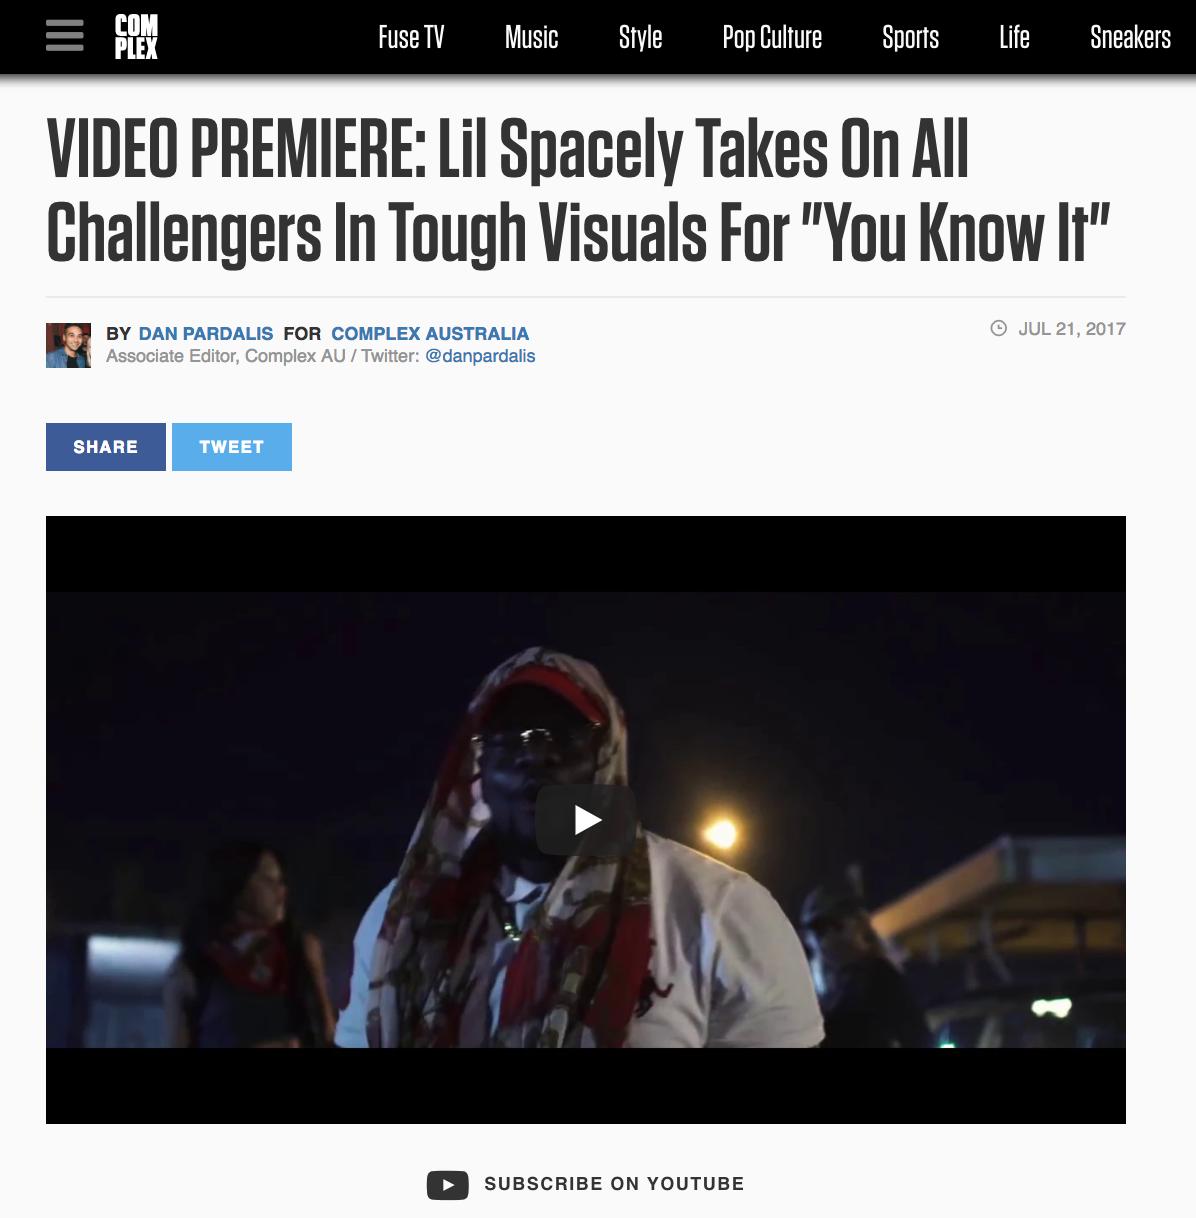 Complex: Video Premiere - July 21st 2017